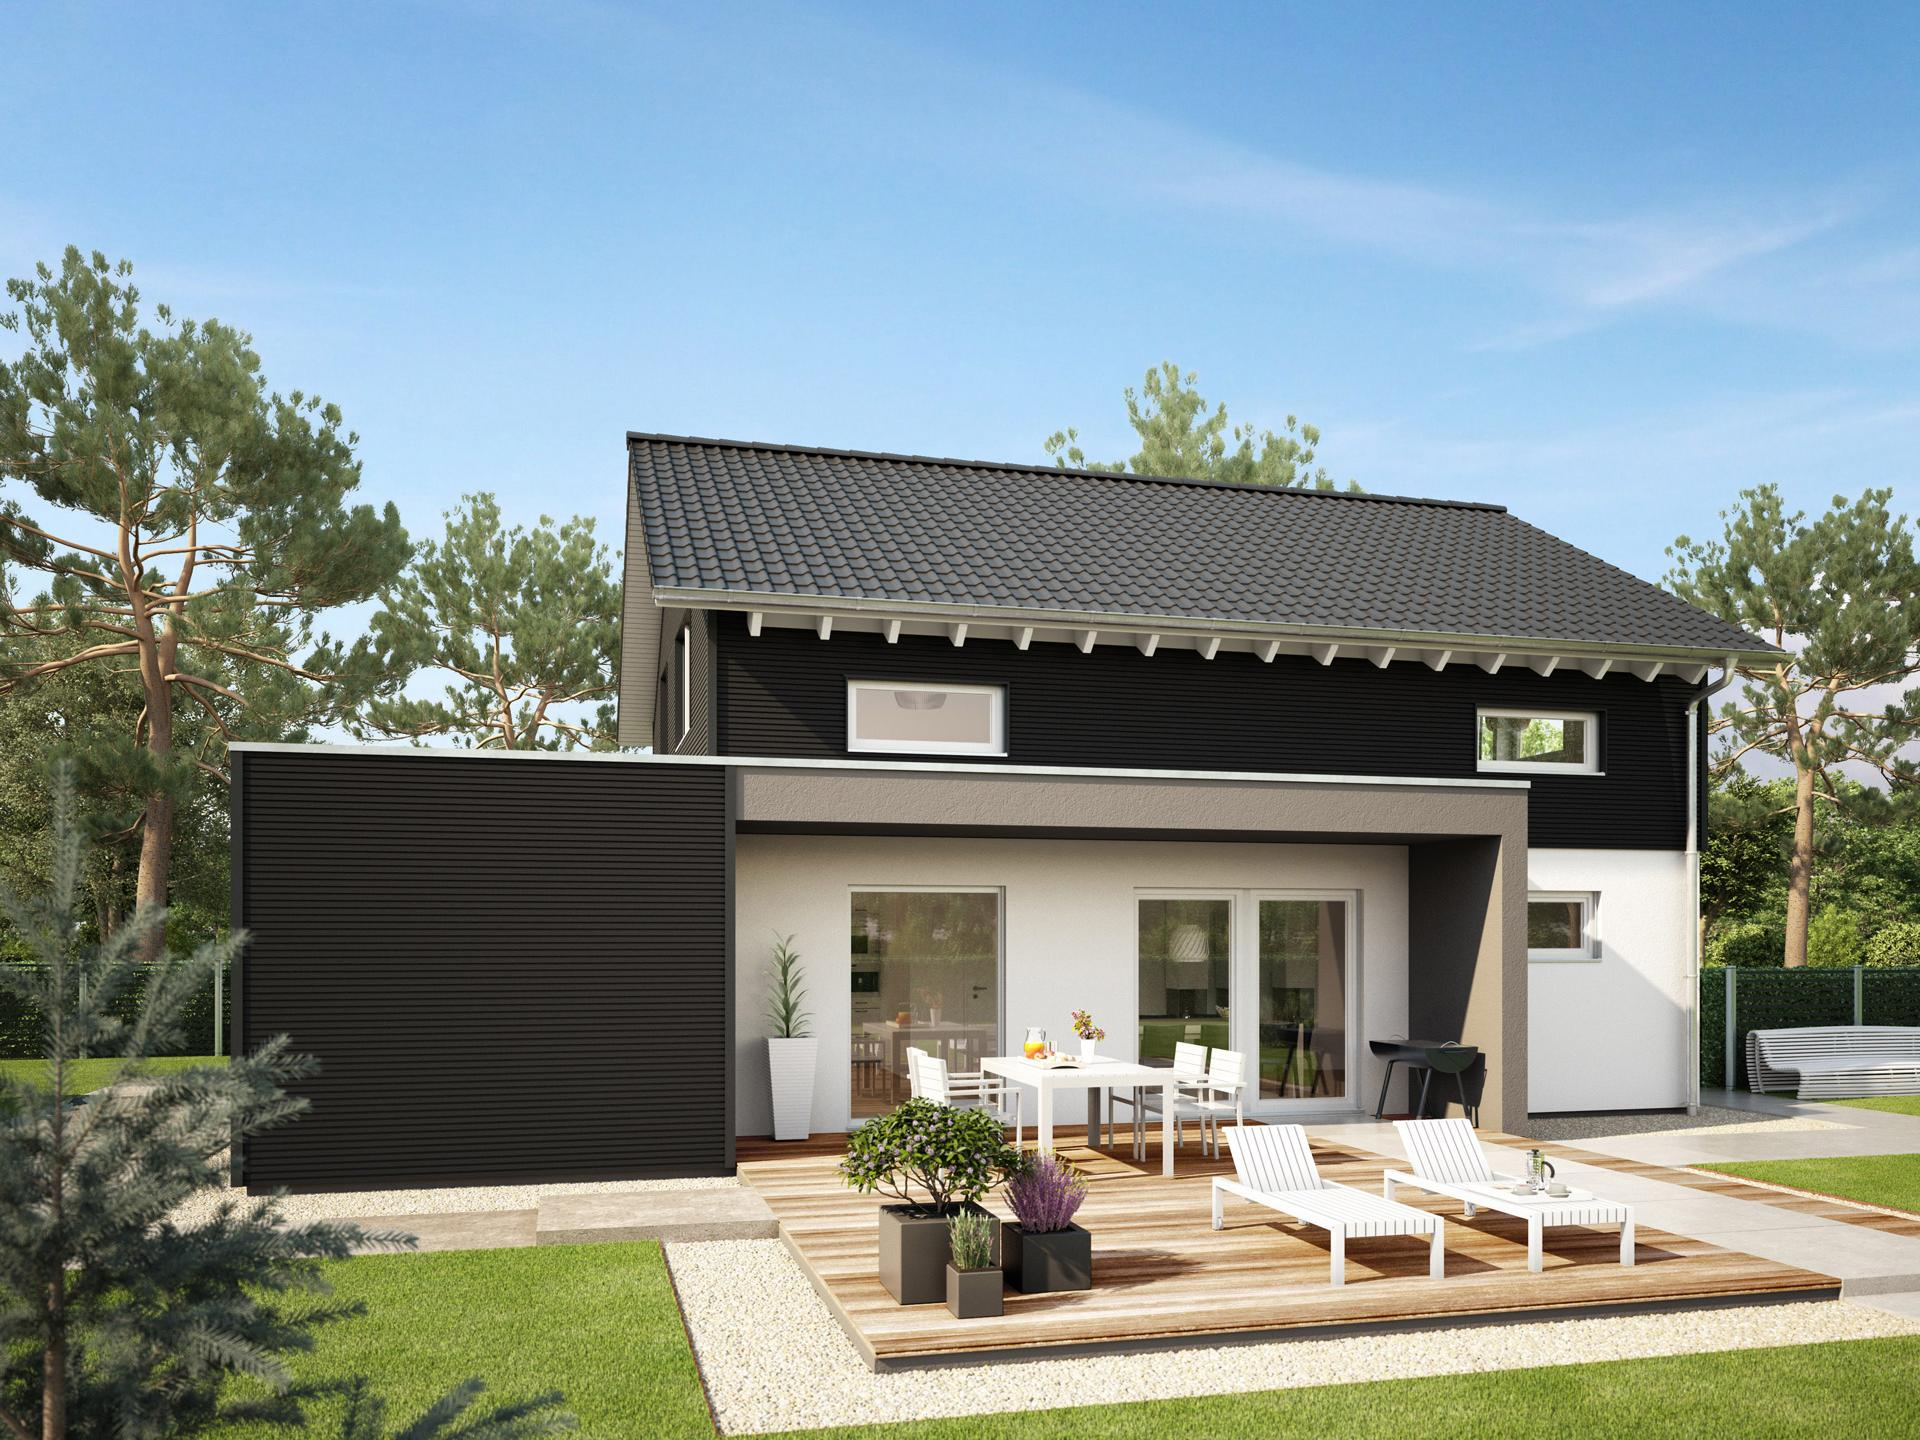 offerta speciale per case. Black Bedroom Furniture Sets. Home Design Ideas